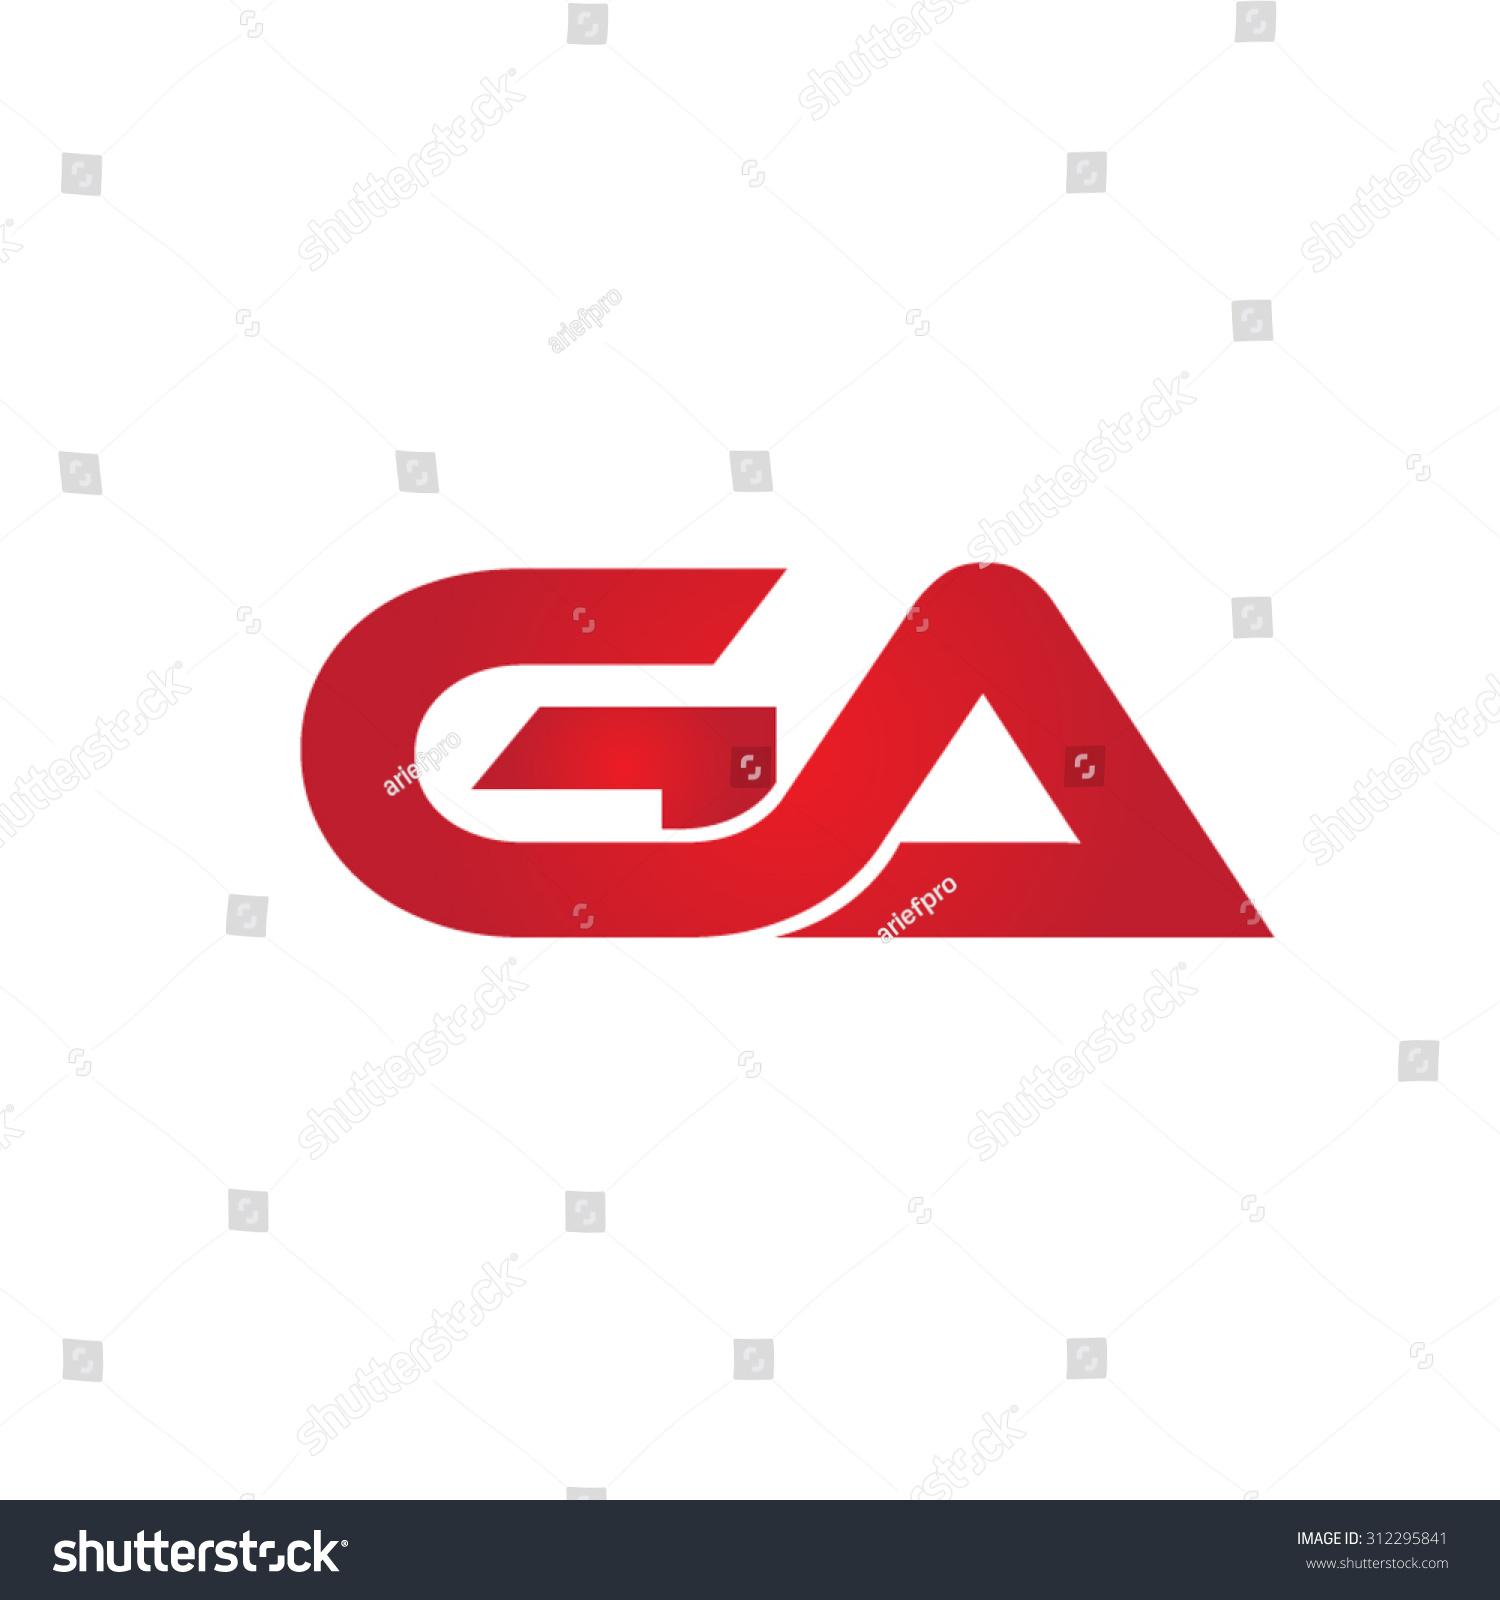 ga company linked letter logo stock vector 312295841 shutterstock. Black Bedroom Furniture Sets. Home Design Ideas